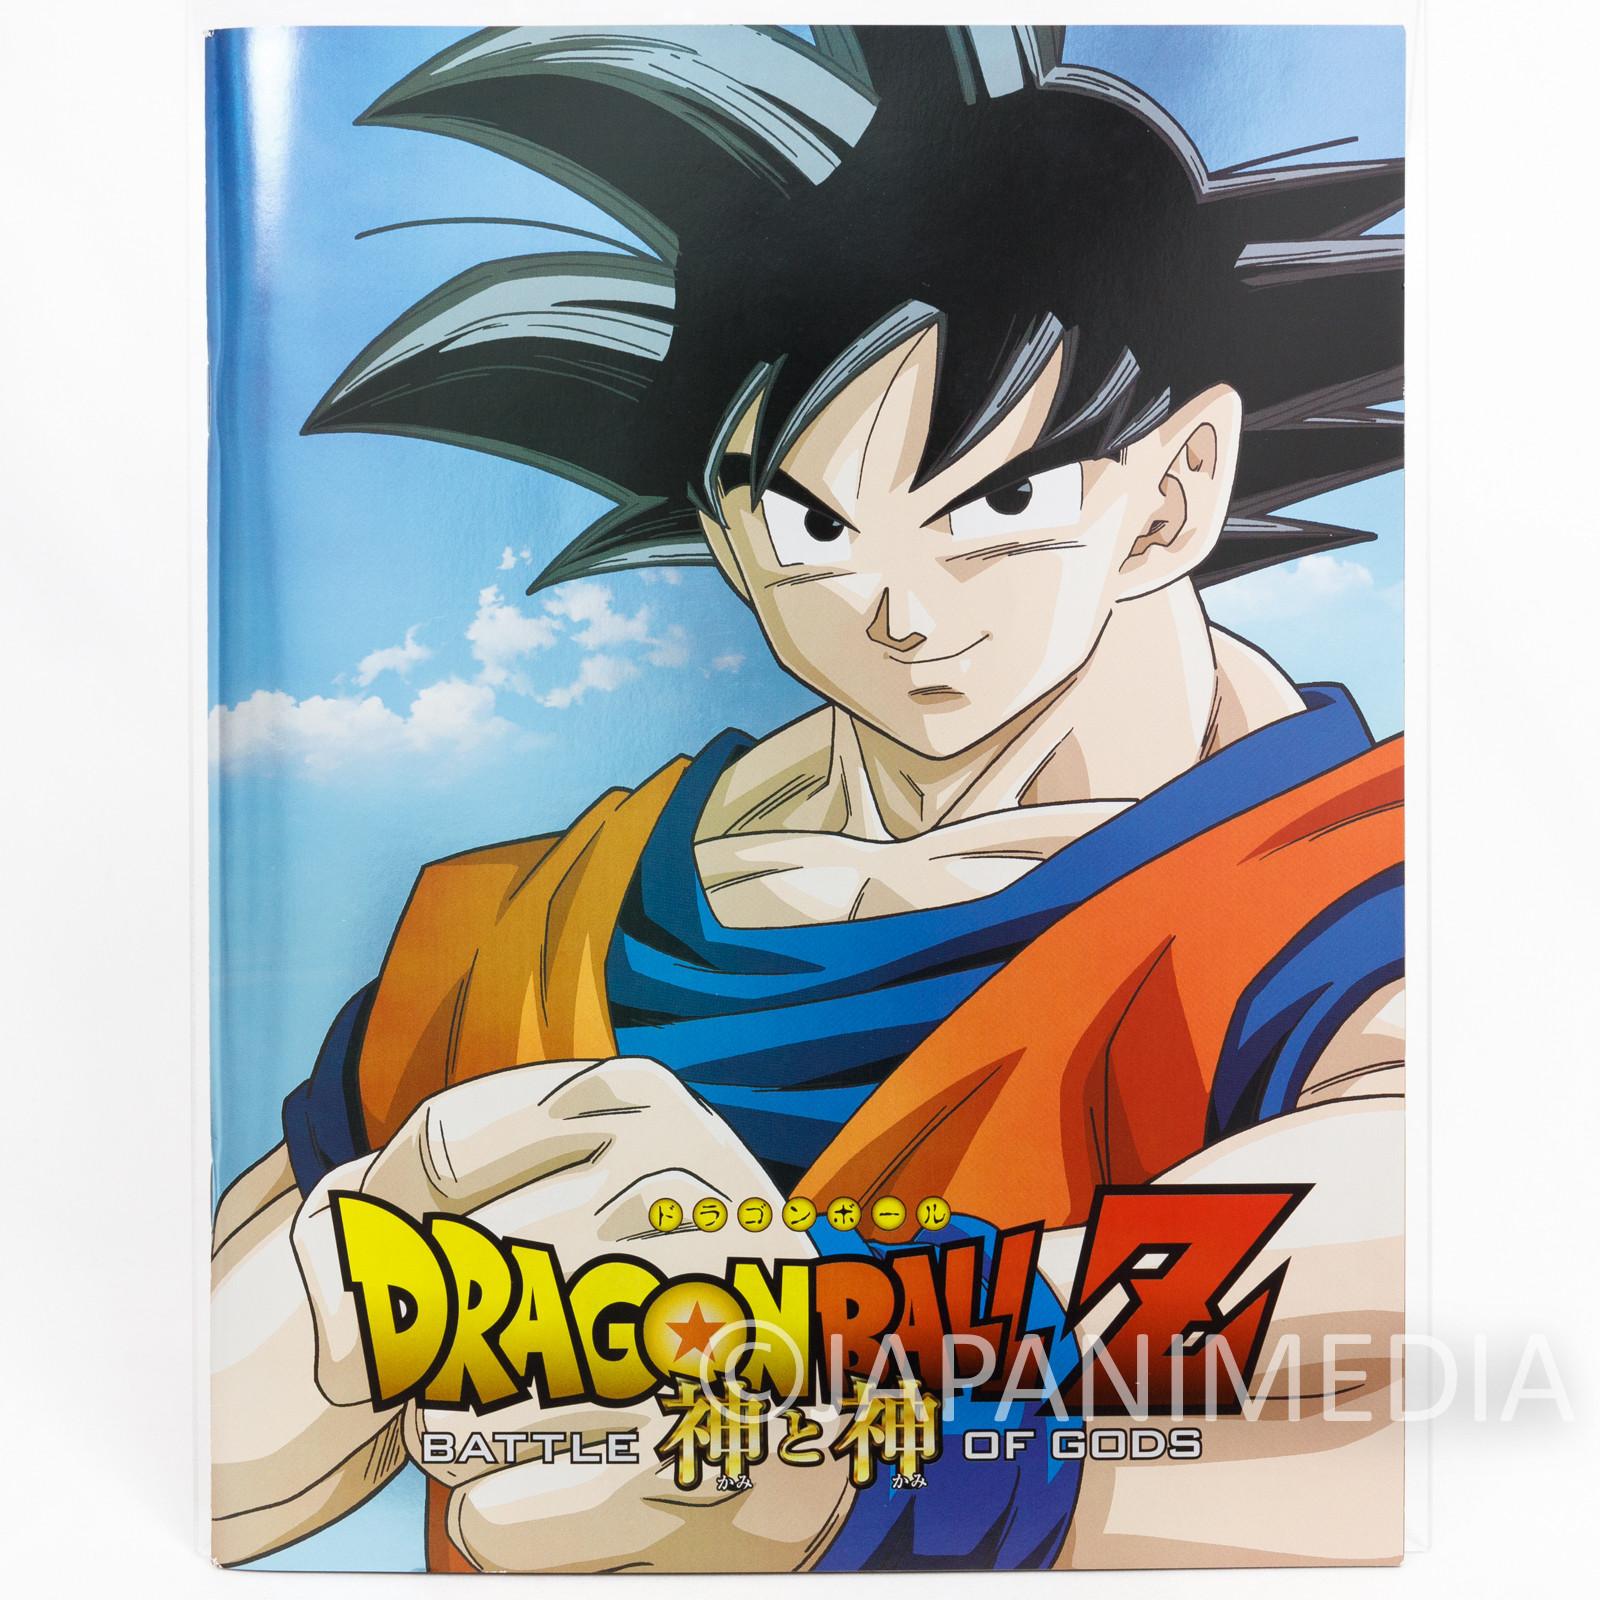 Dragon Ball Z Battle of Gods Movie Program Art Book JAPAN ANIME MANGA